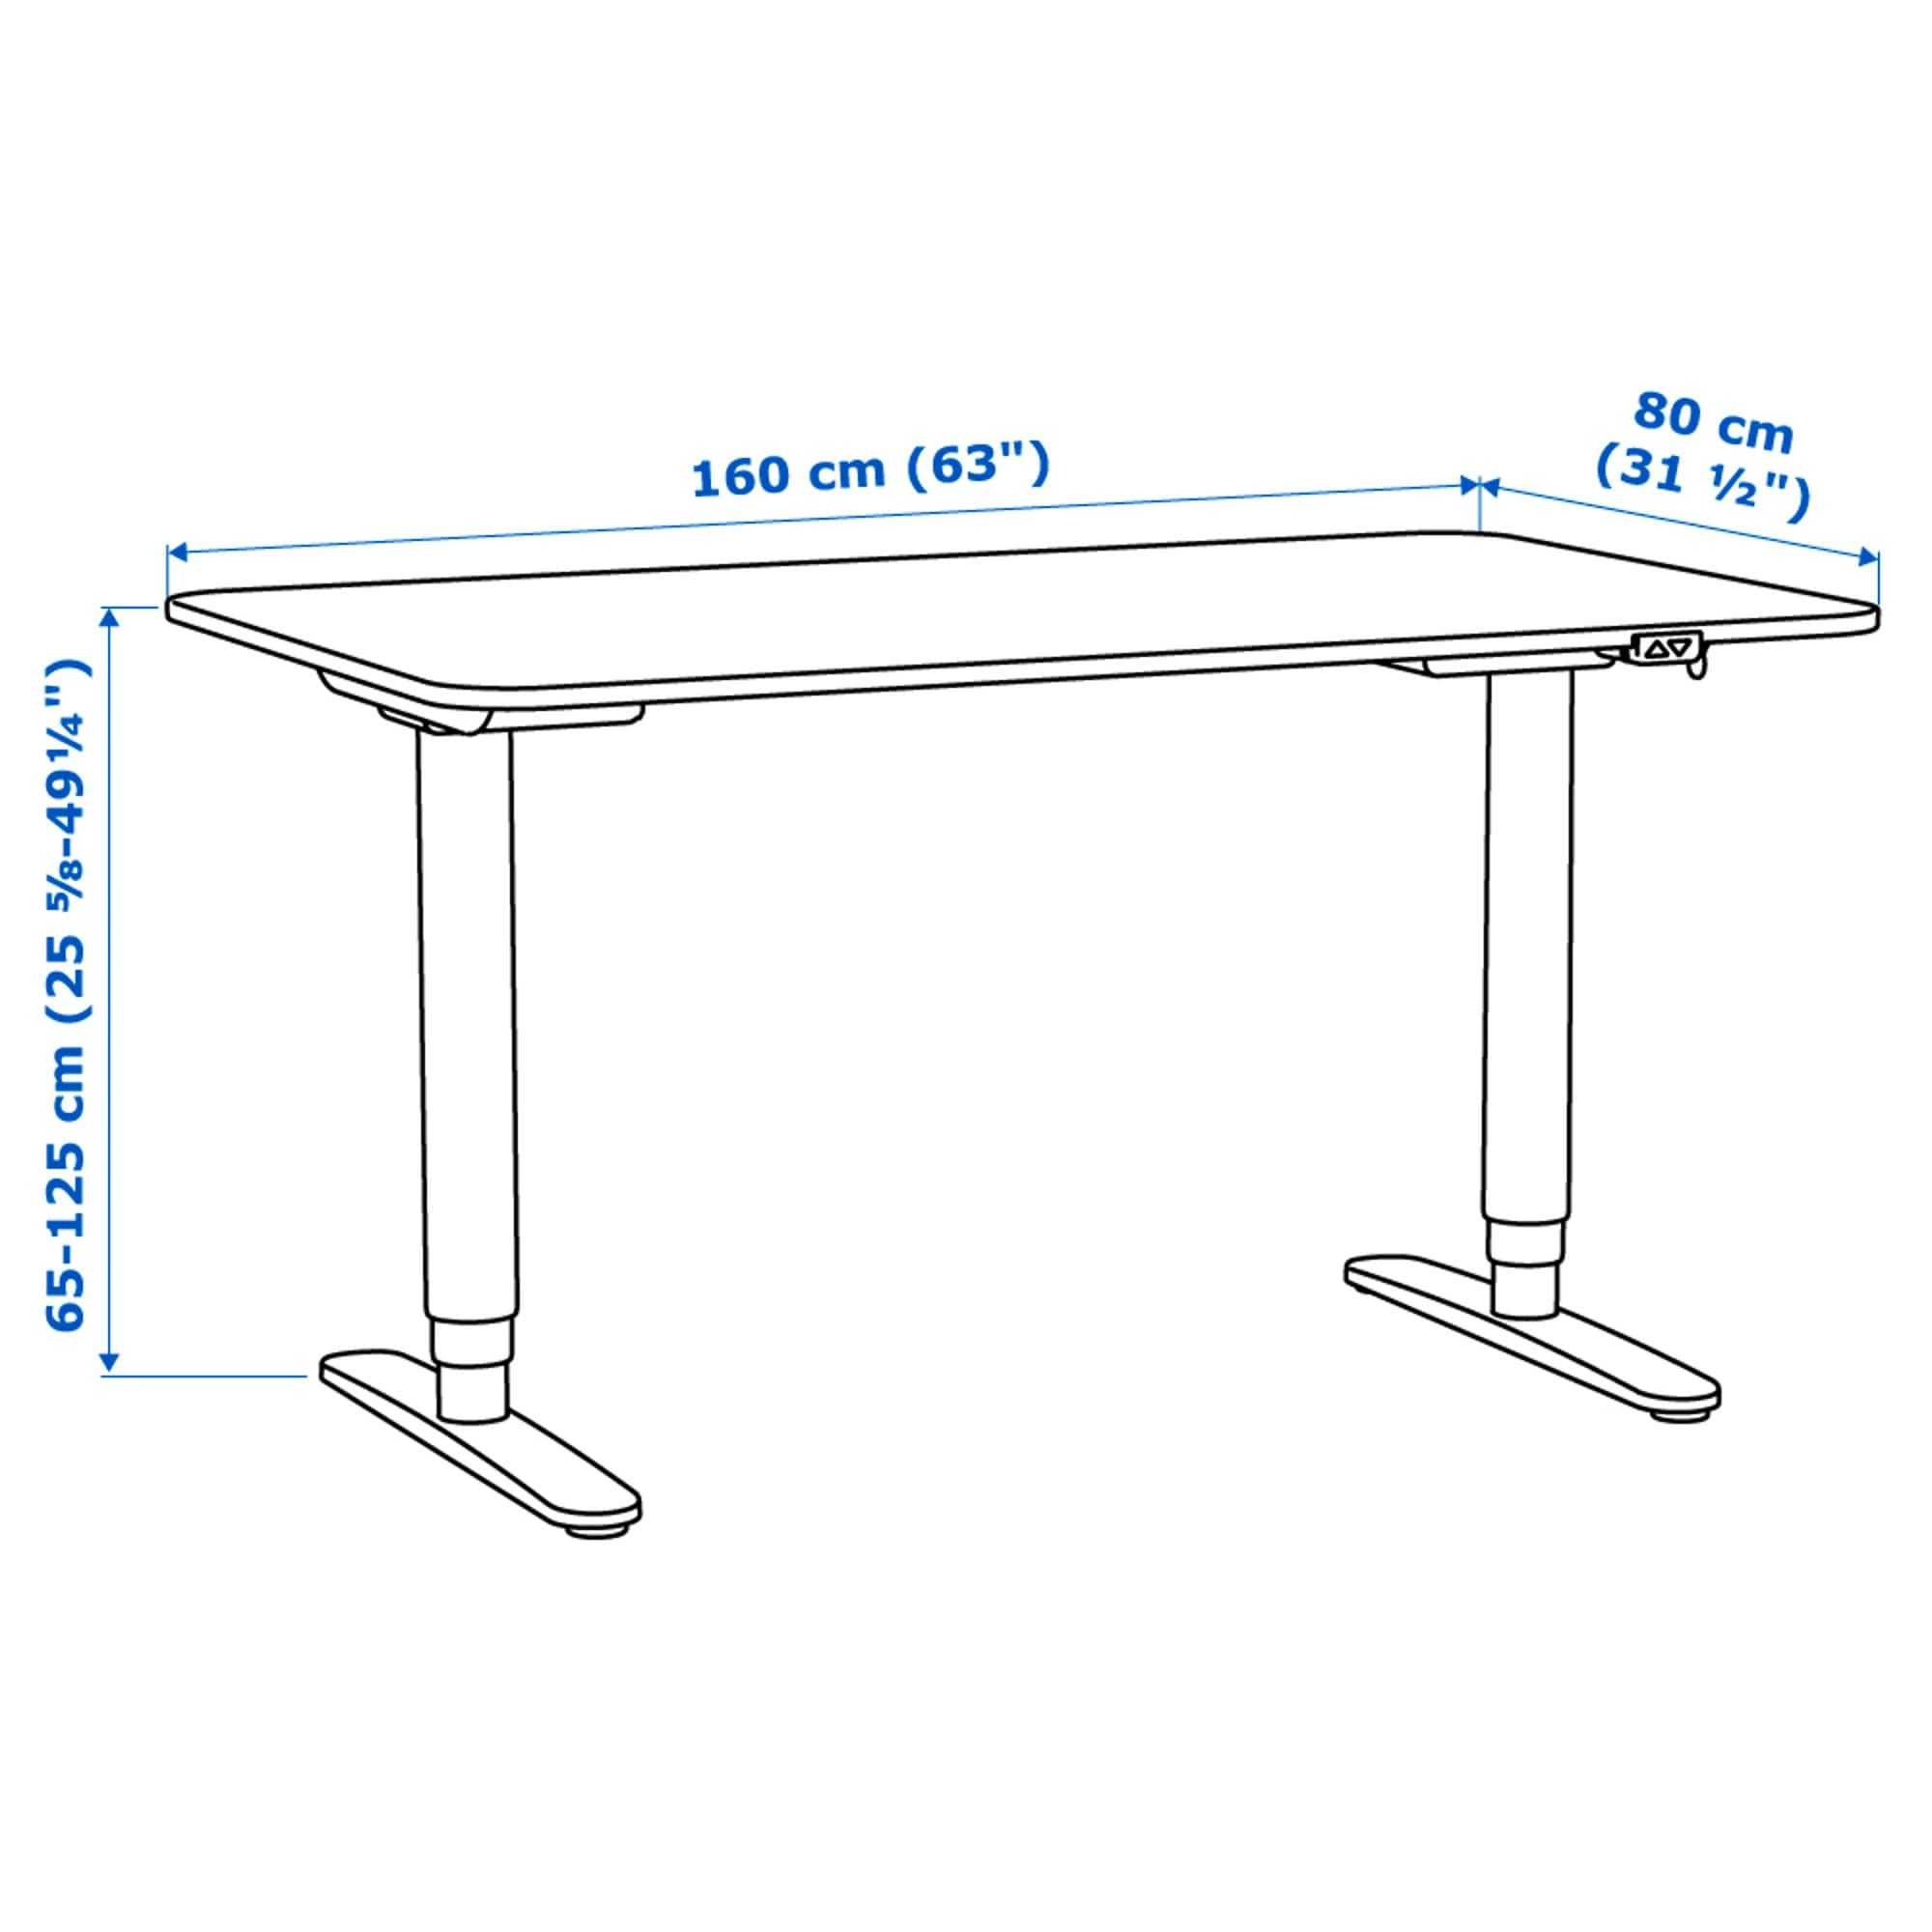 Bekant Scrivania Ikea.Bekant Scrivania Regolabile In Altezza Bianco Detail In